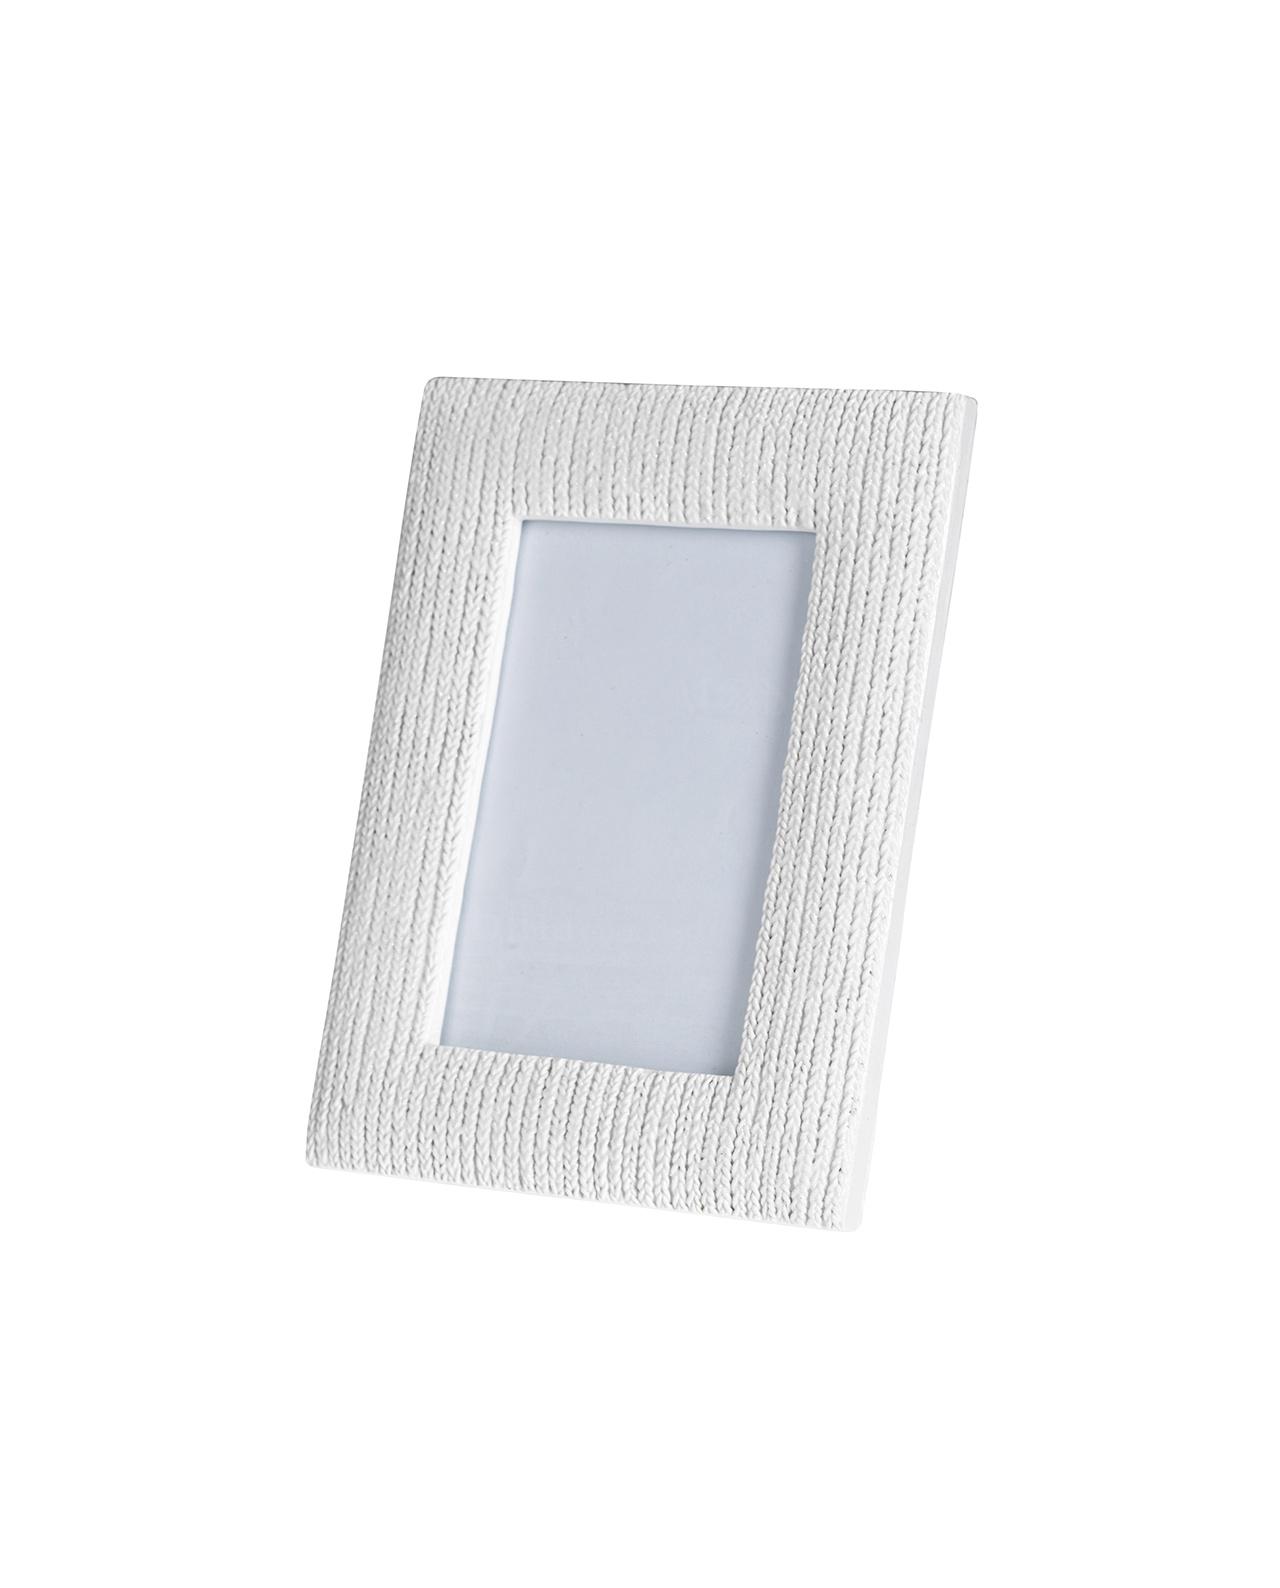 Cornice portafoto da tavolo bianco intreccio brandani - Portafoto da tavolo 20x30 ...